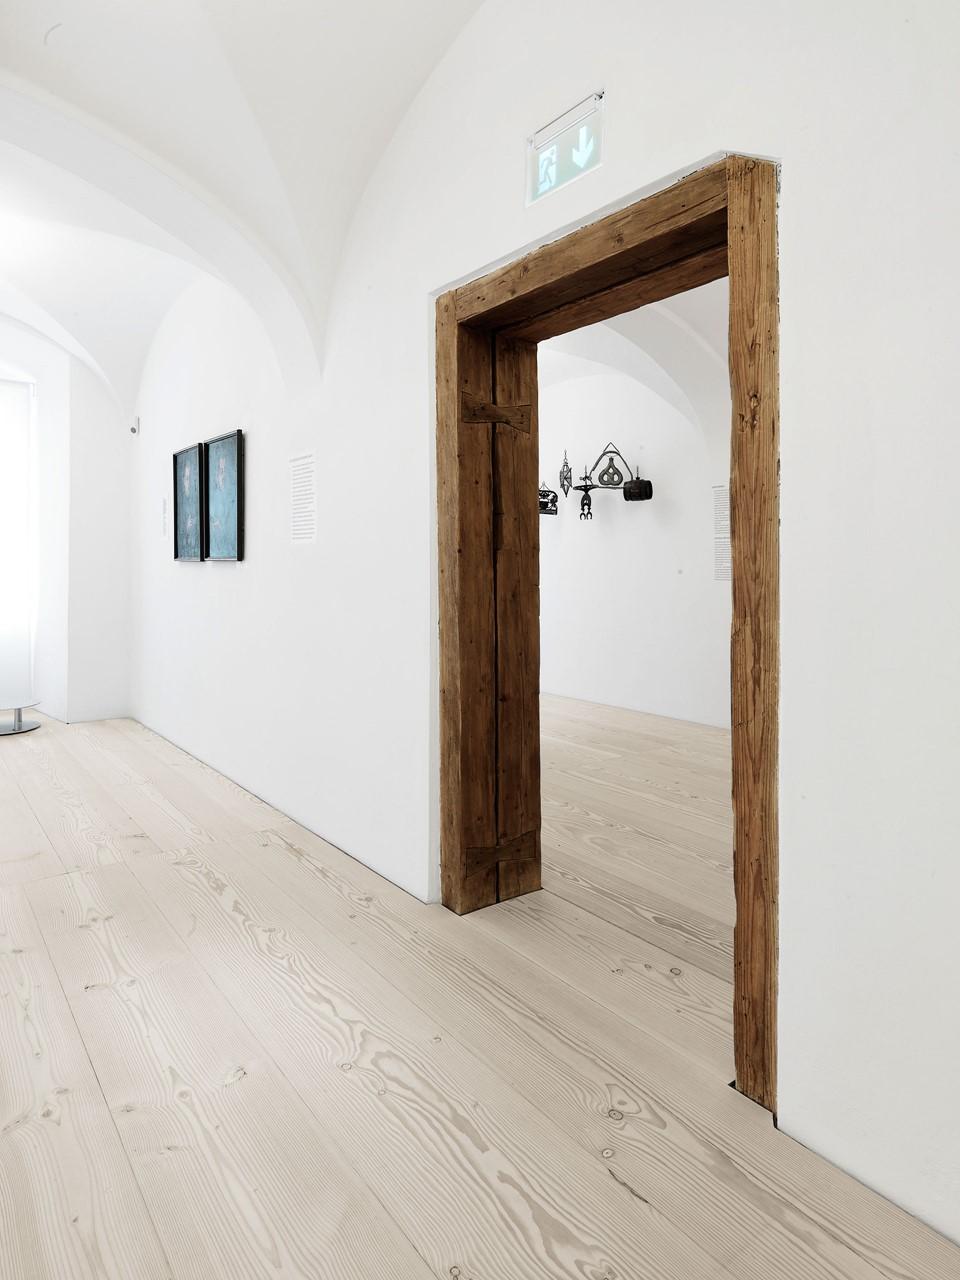 douglas-wooden-floorboards_lye-natural-soap_stadtmuseum-freising_dinesen.jpg